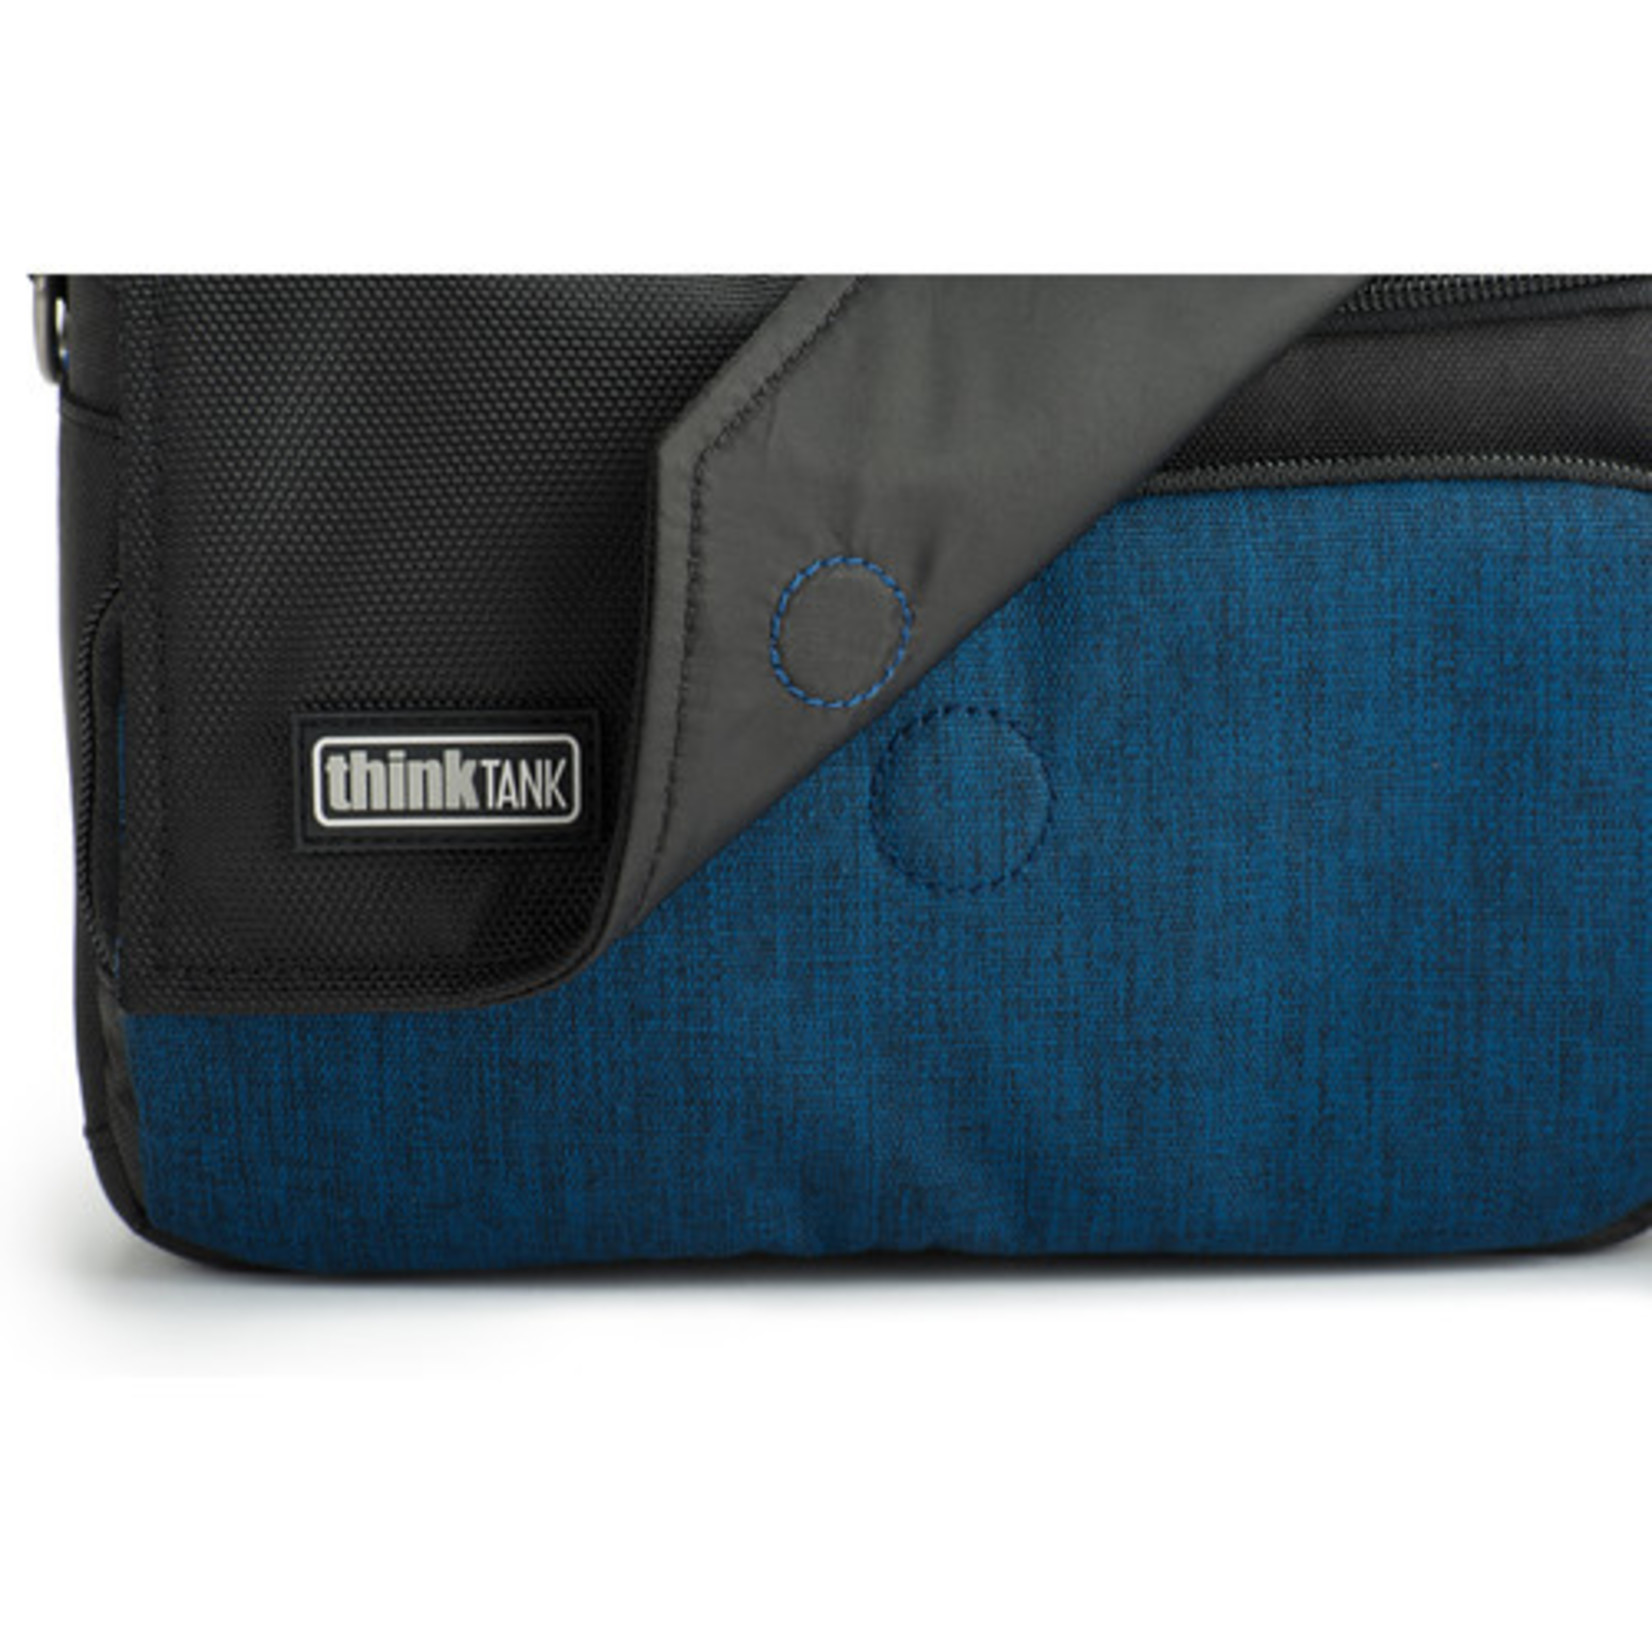 ThinkTank Mirrorless Mover 30i - Dark Blue